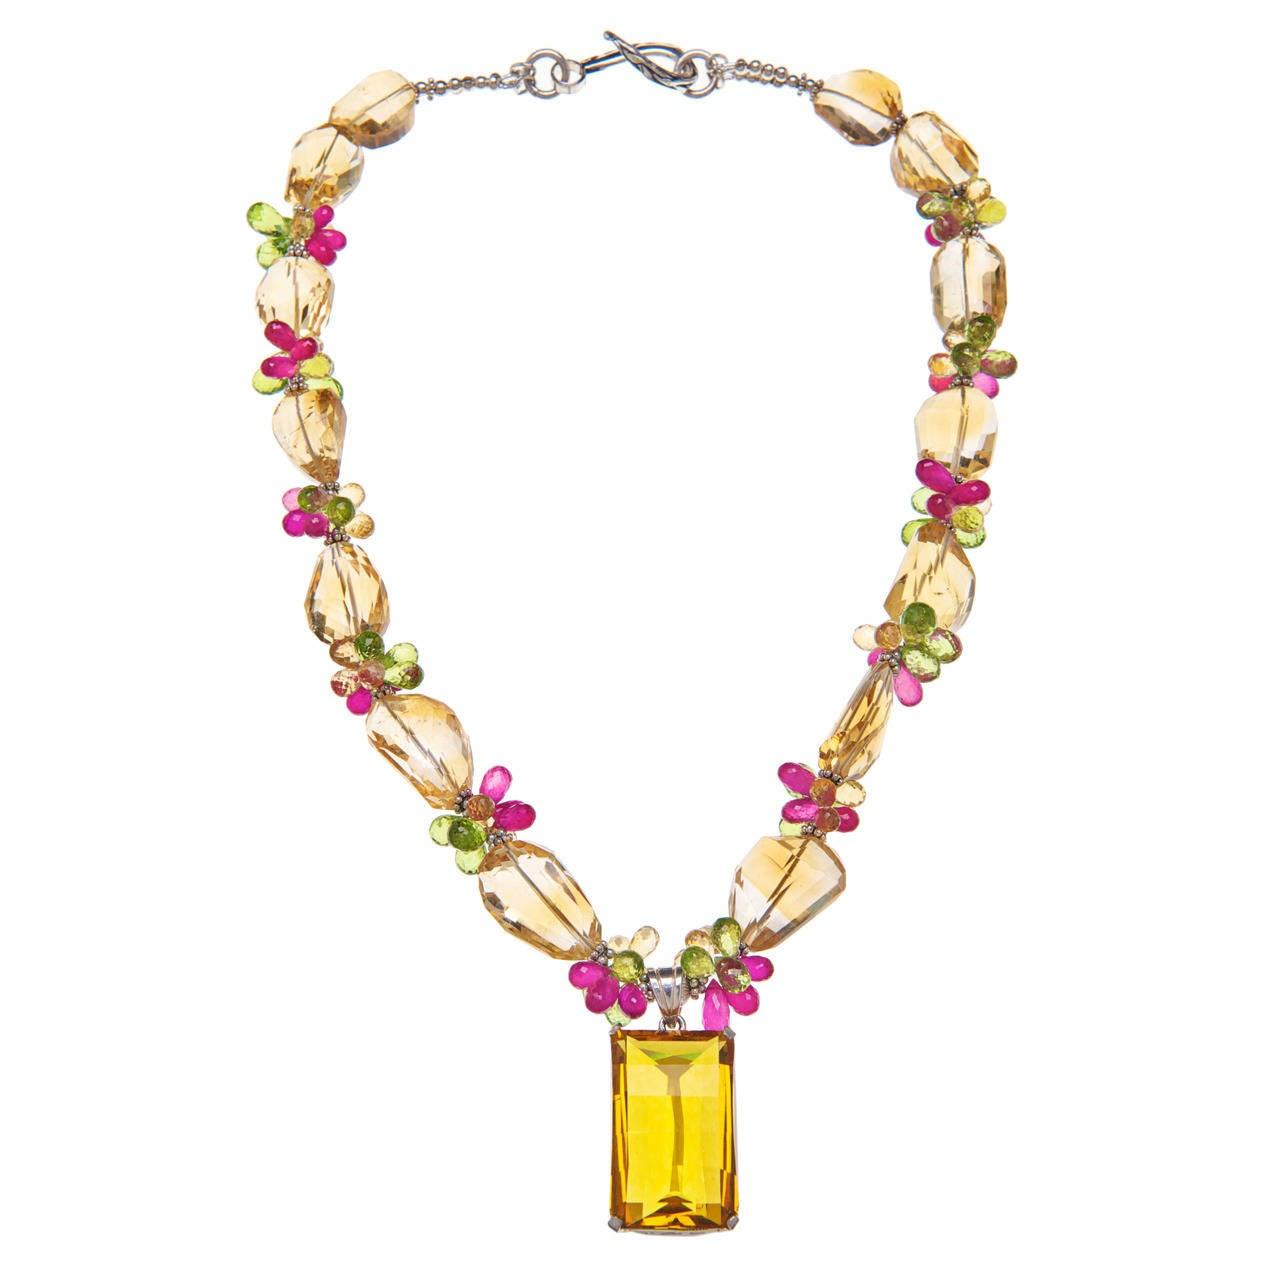 Deborah Liebman 77 Carat Citrine Pendant Ruby Peridot Sterling Silver Necklace